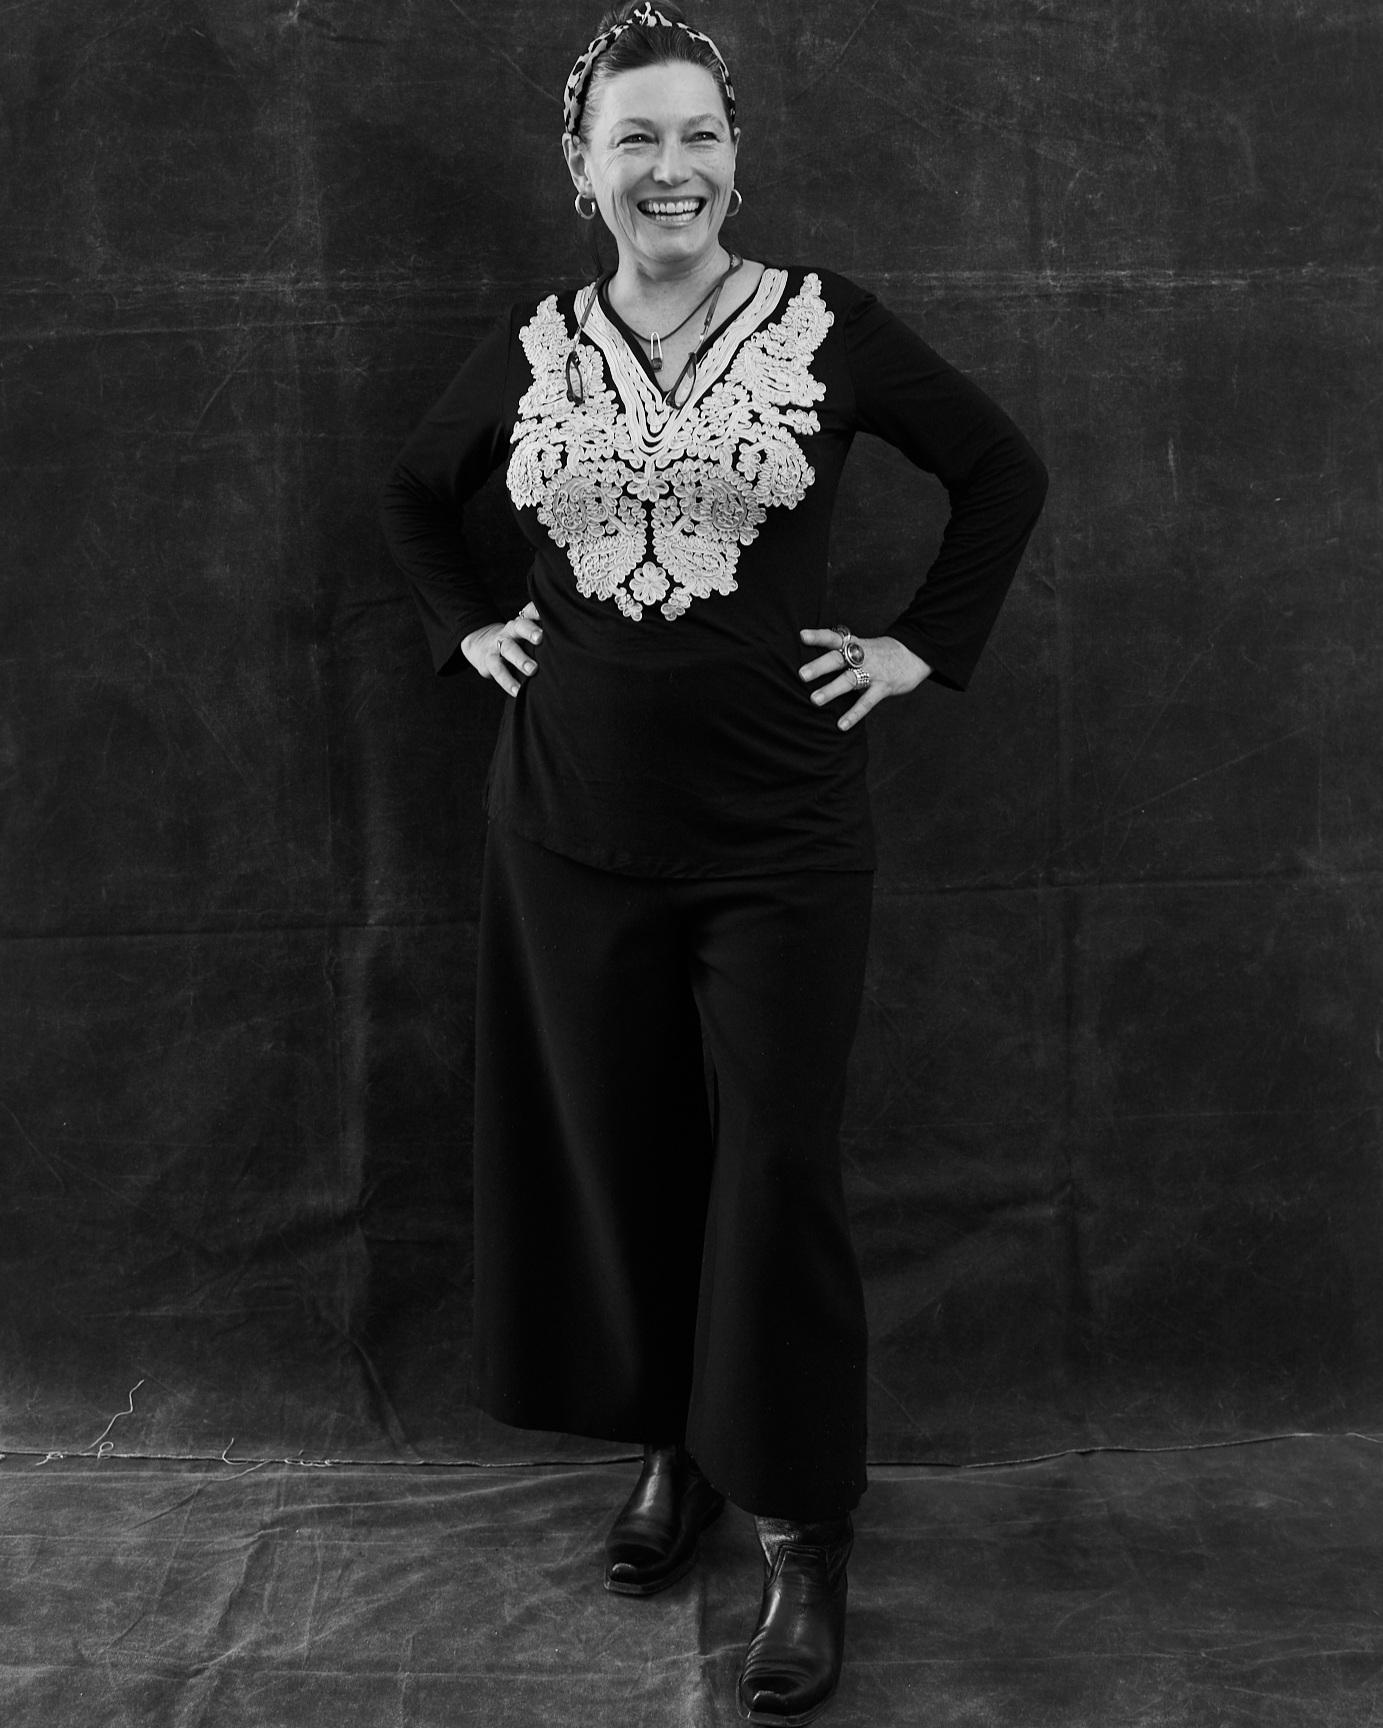 Tess+Schofield+AFTW+Portraits++0284.jpg